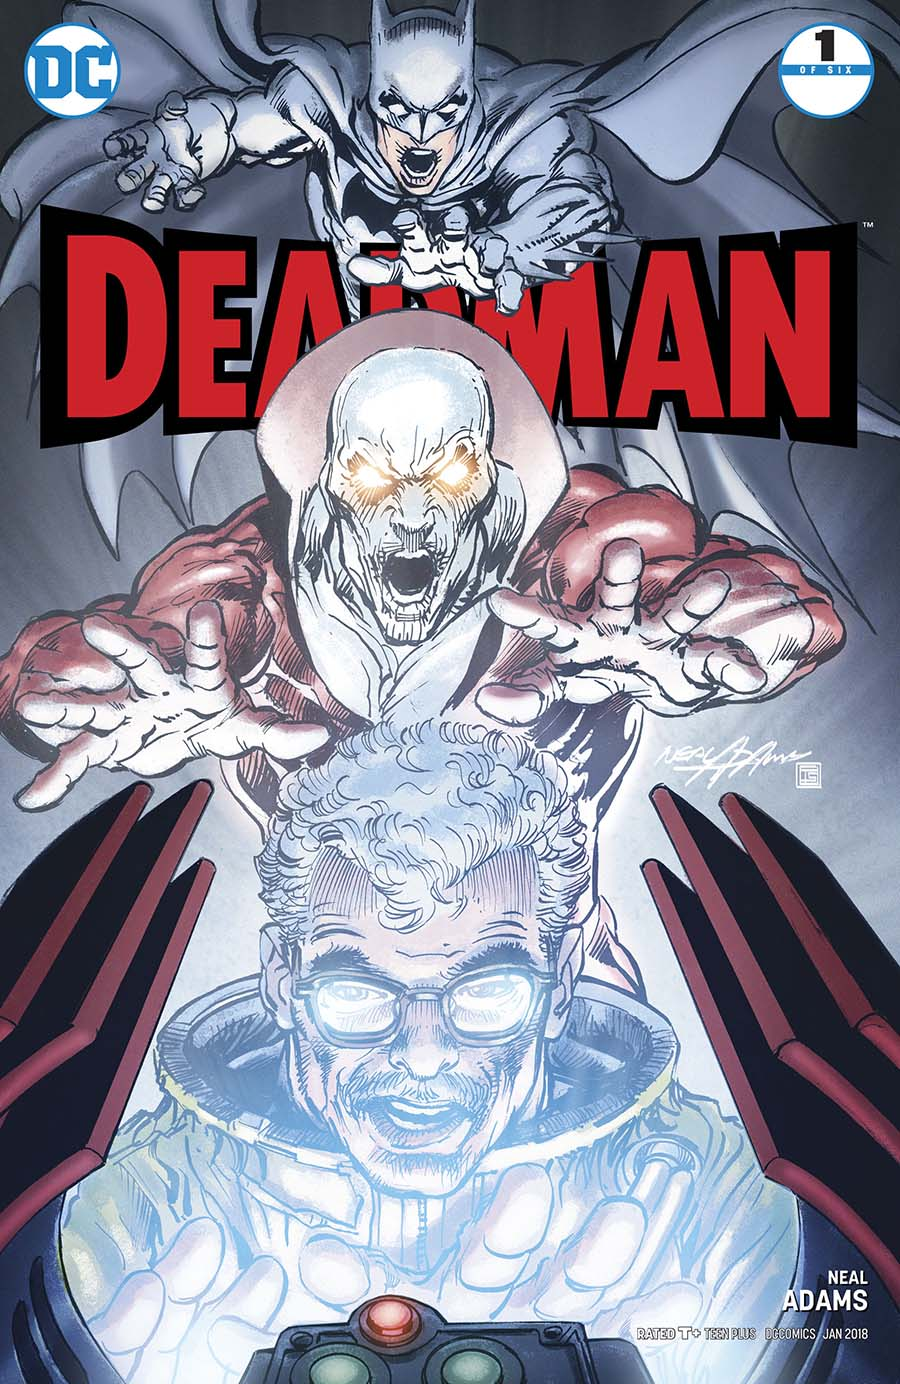 Deadman Vol 5 #1 Cover A Regular Neal Adams Glow-In-The-Dark Cover